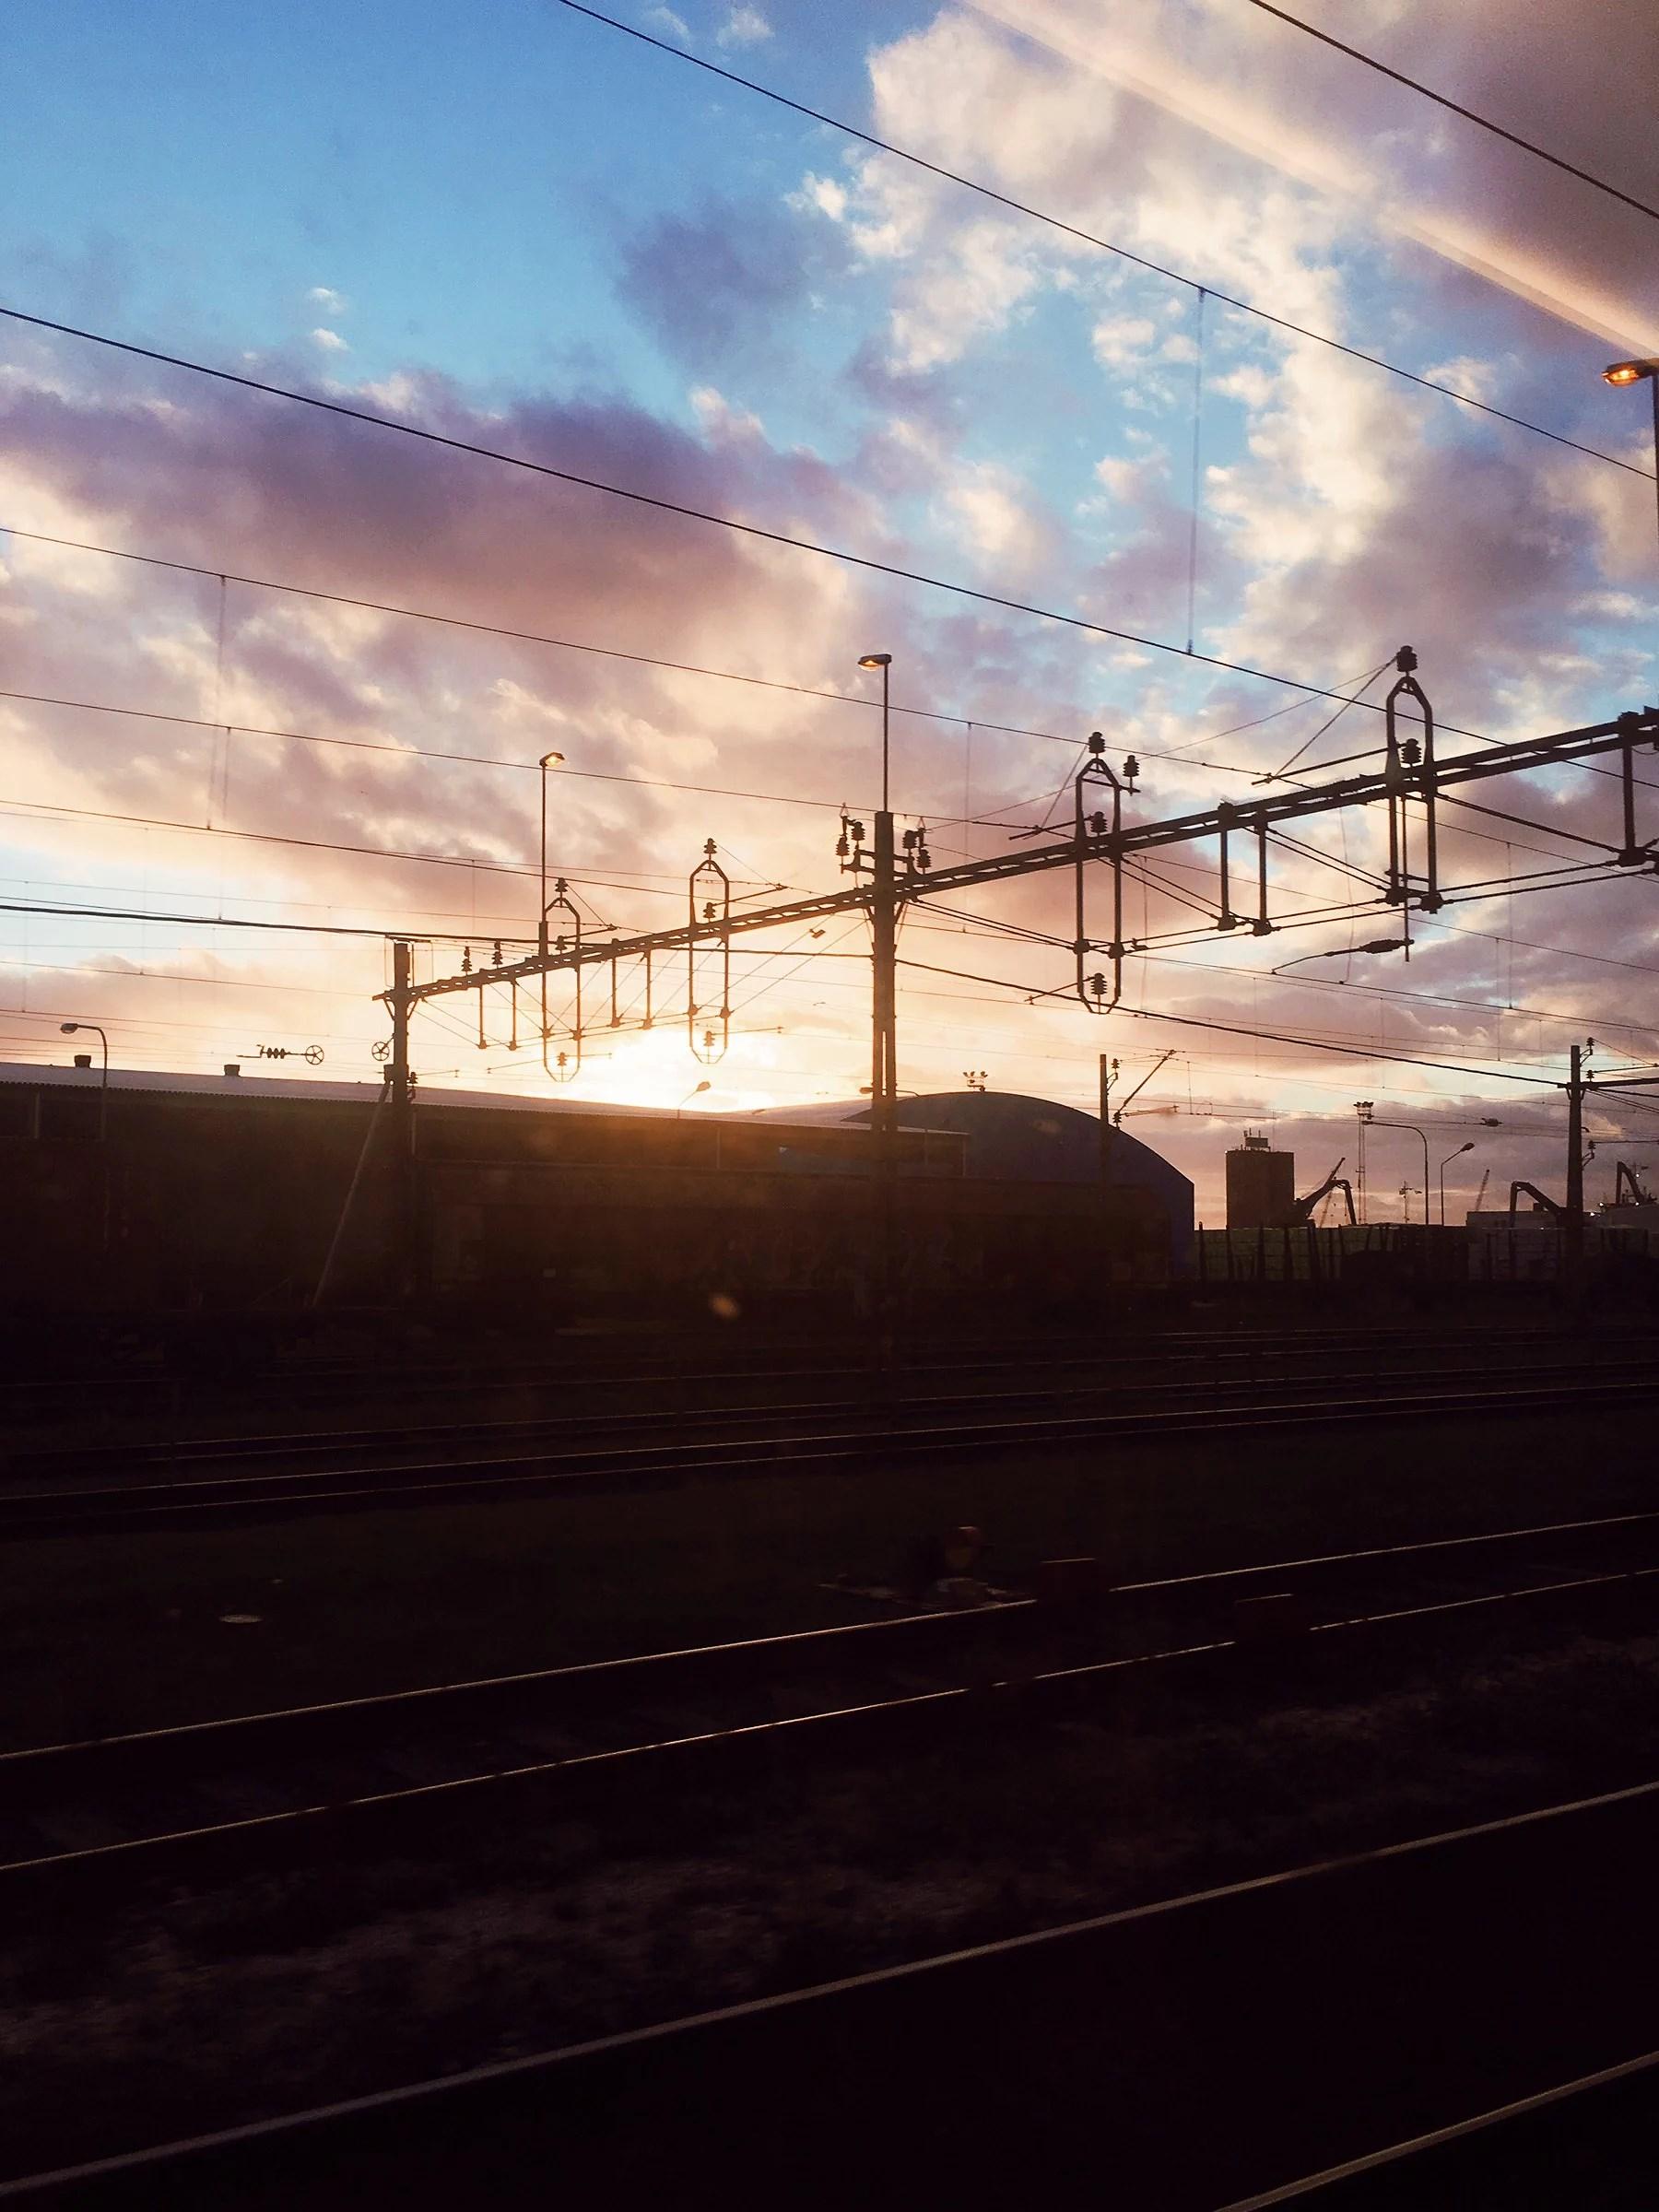 Midnight train +